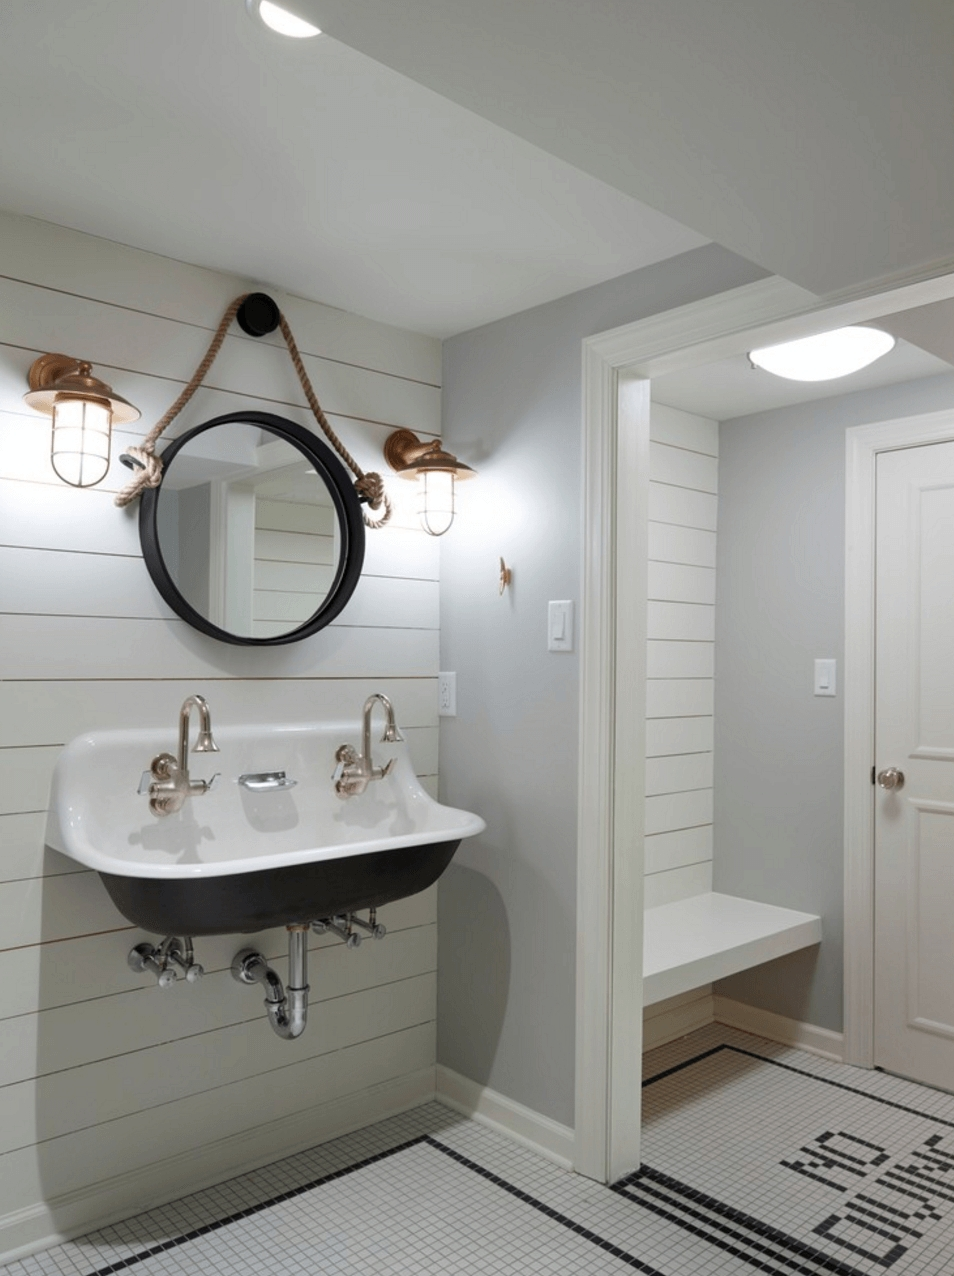 Bathrooms Design : Bathroom Wall Mirrors Black Bathroom Mirror For Large Framed Bathroom Wall Mirrors (Image 16 of 20)